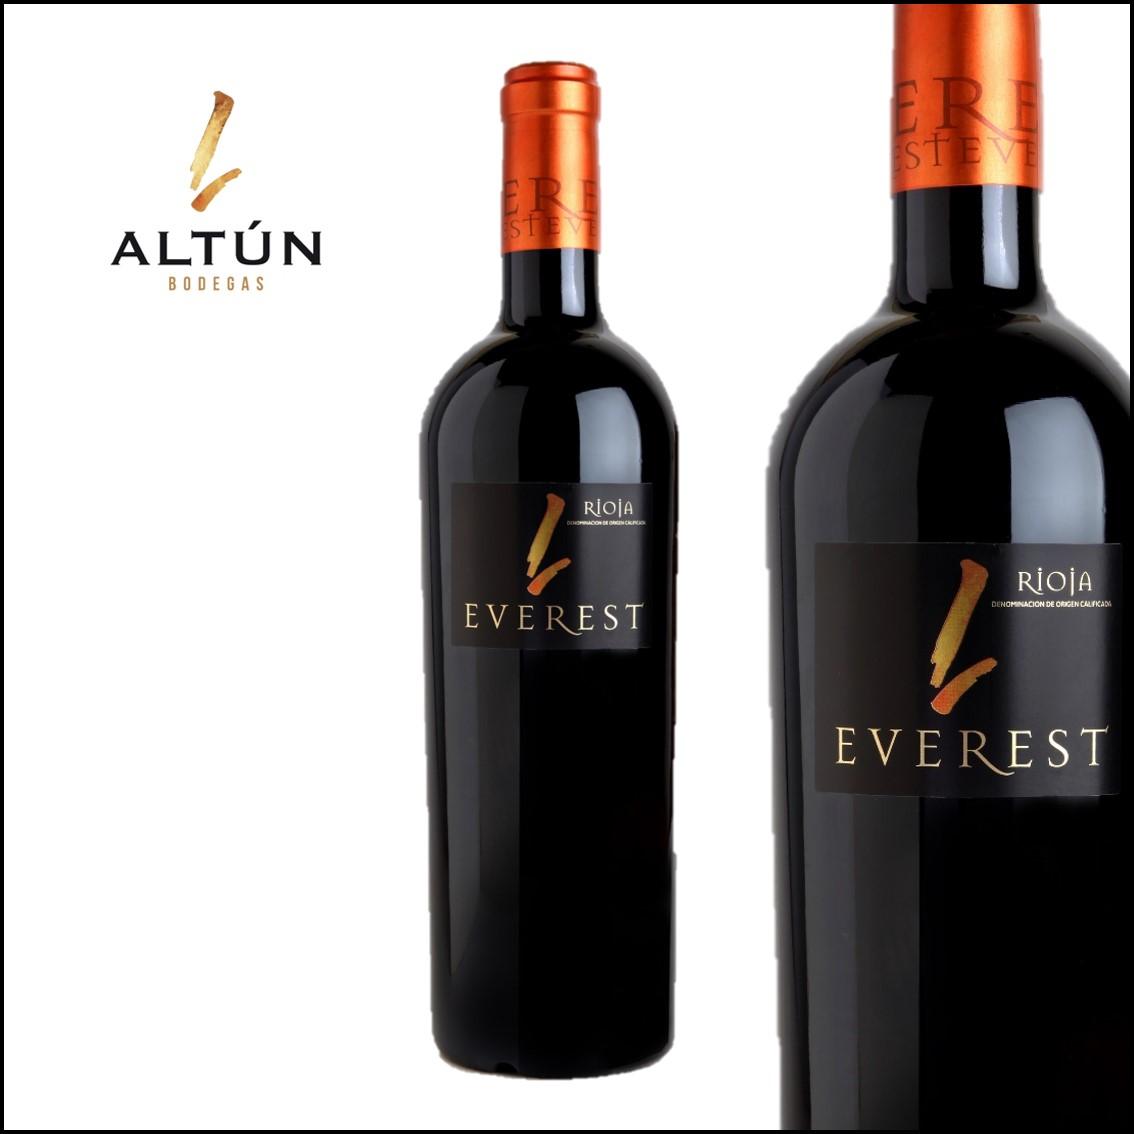 Altún «Everest» D.O.Ca. Rioja